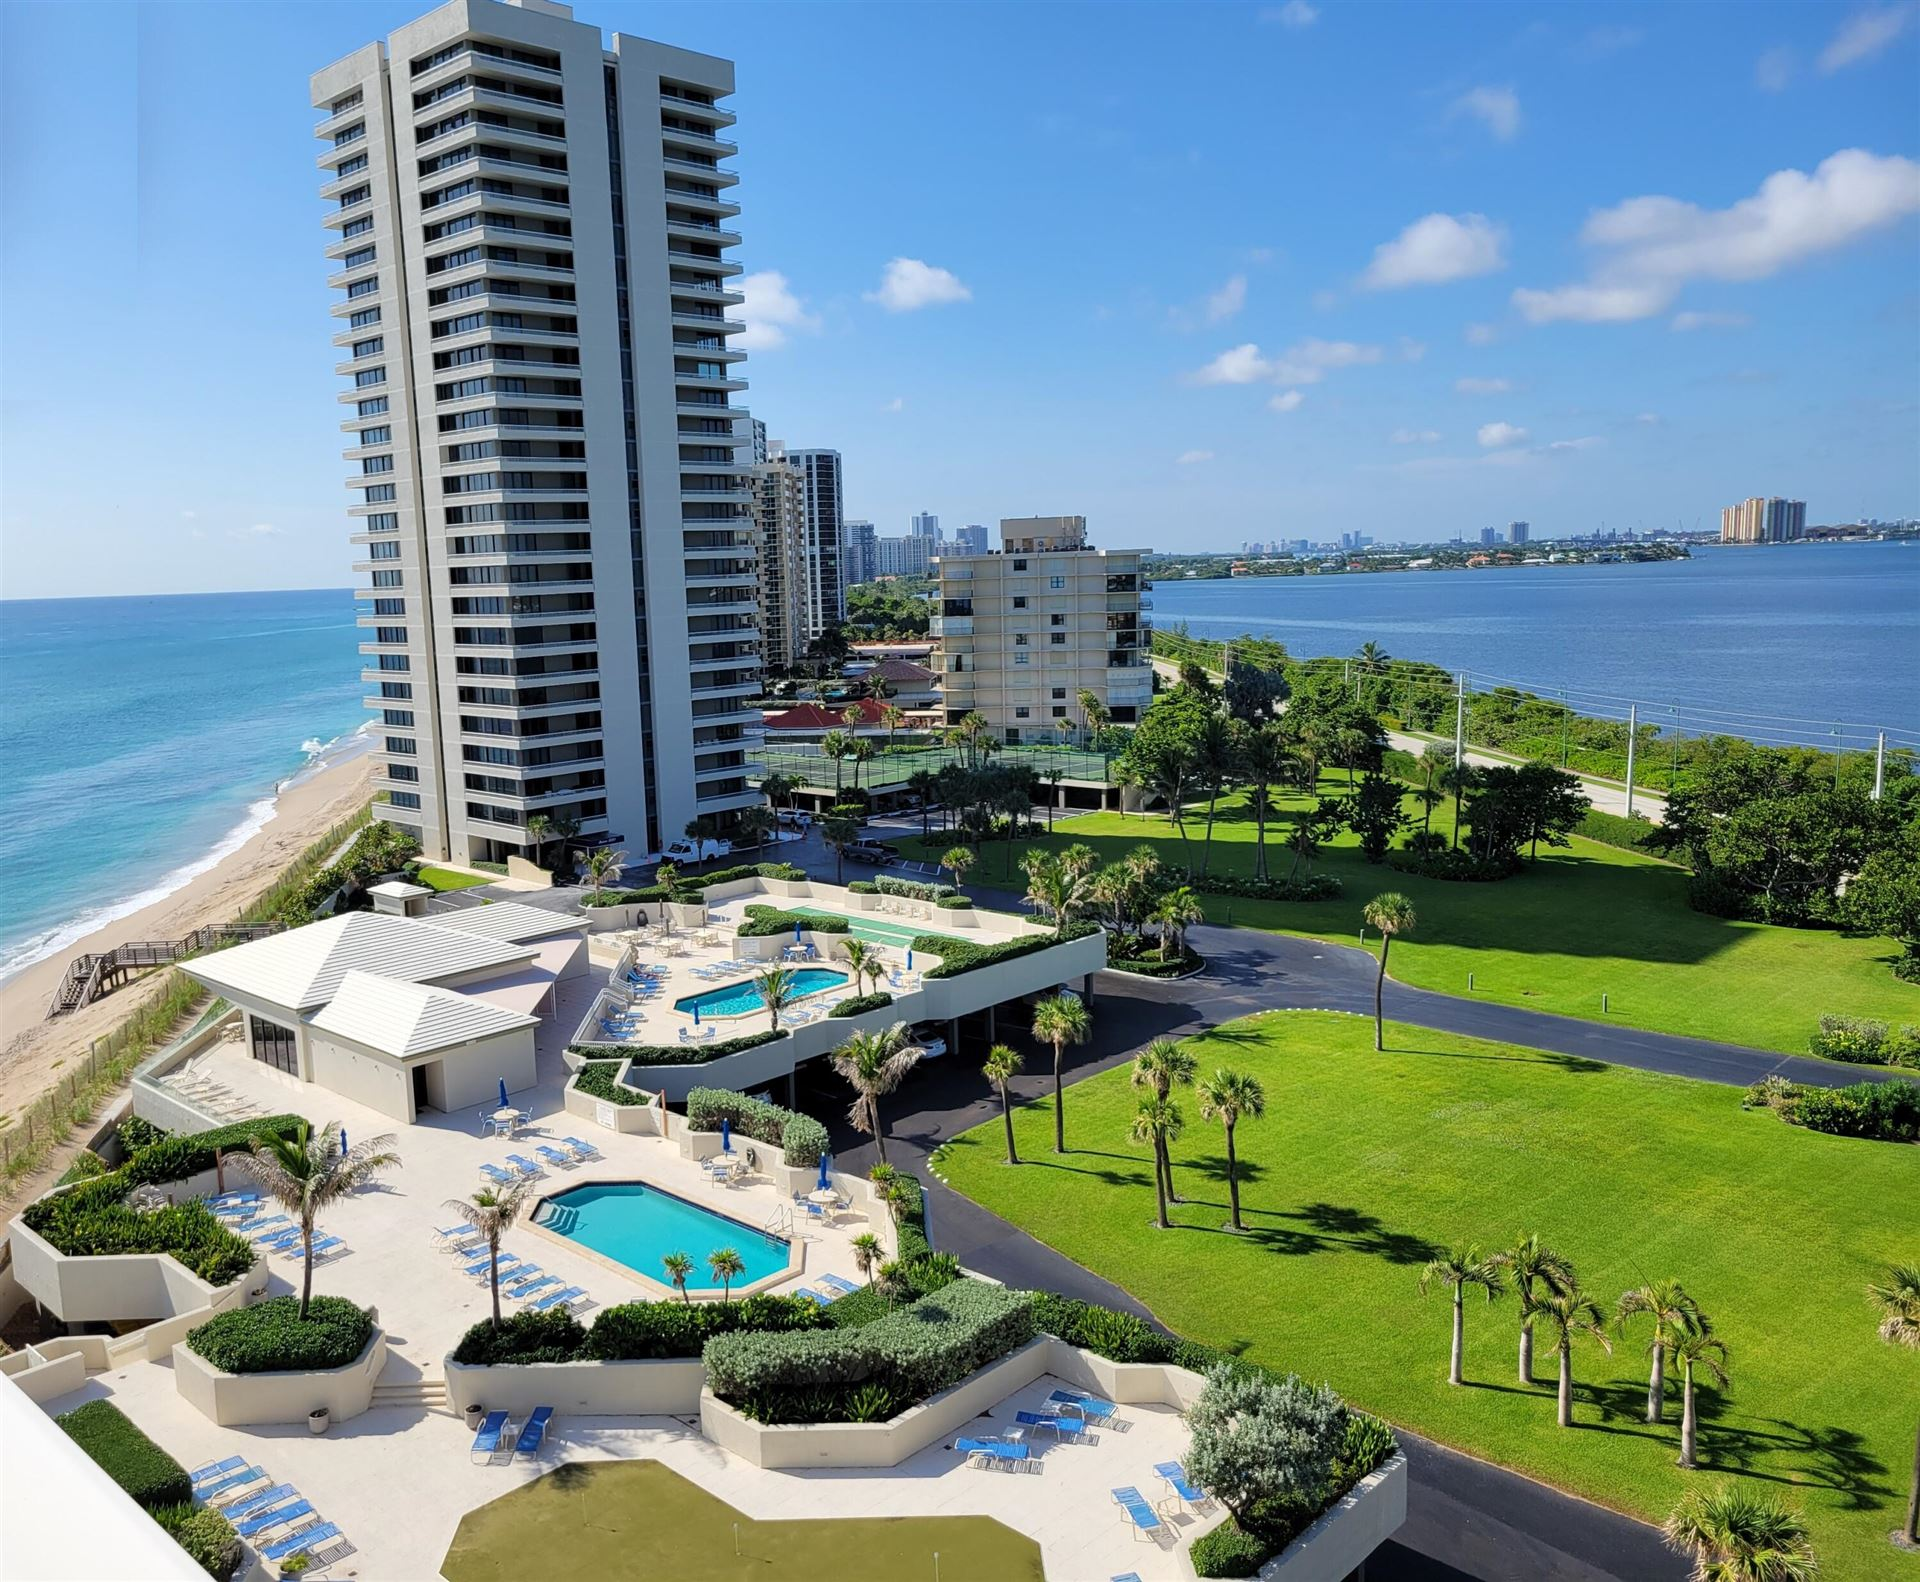 Photo for 5540 N Ocean Drive #9b, Singer Island, FL 33404 (MLS # RX-10745151)